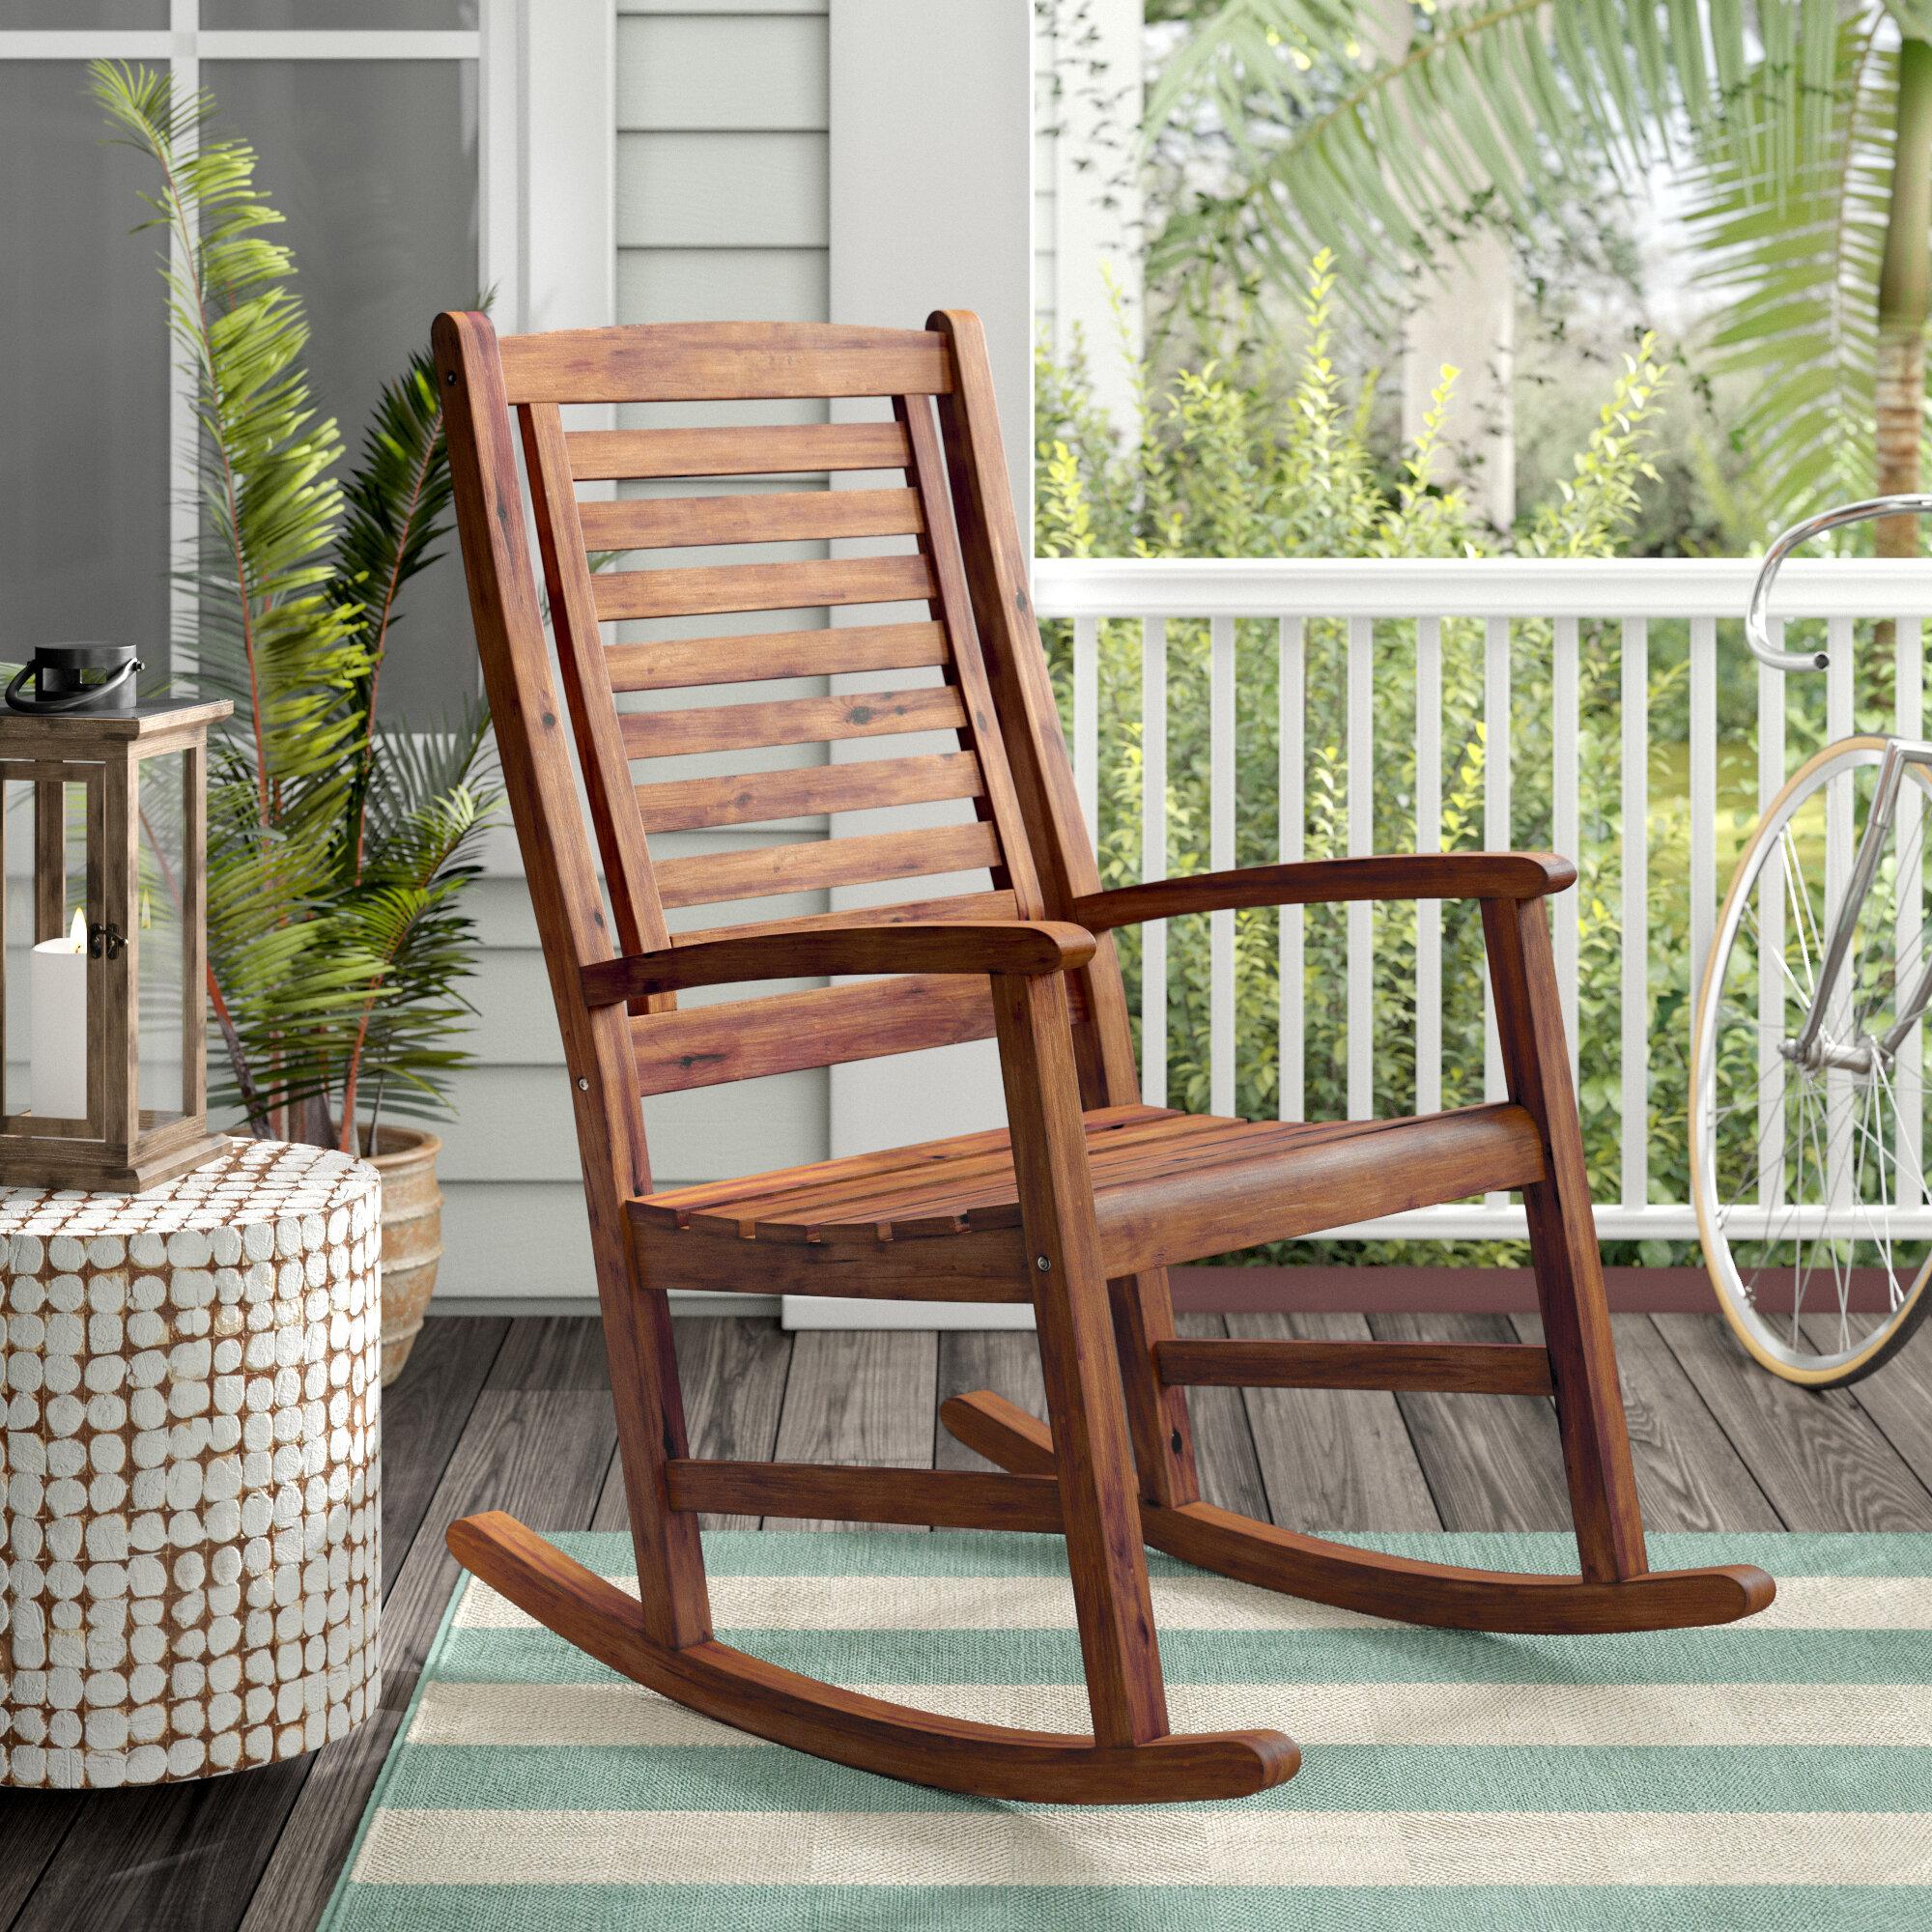 Outstanding Rothstein Outdoor Rocking Chair Unemploymentrelief Wooden Chair Designs For Living Room Unemploymentrelieforg